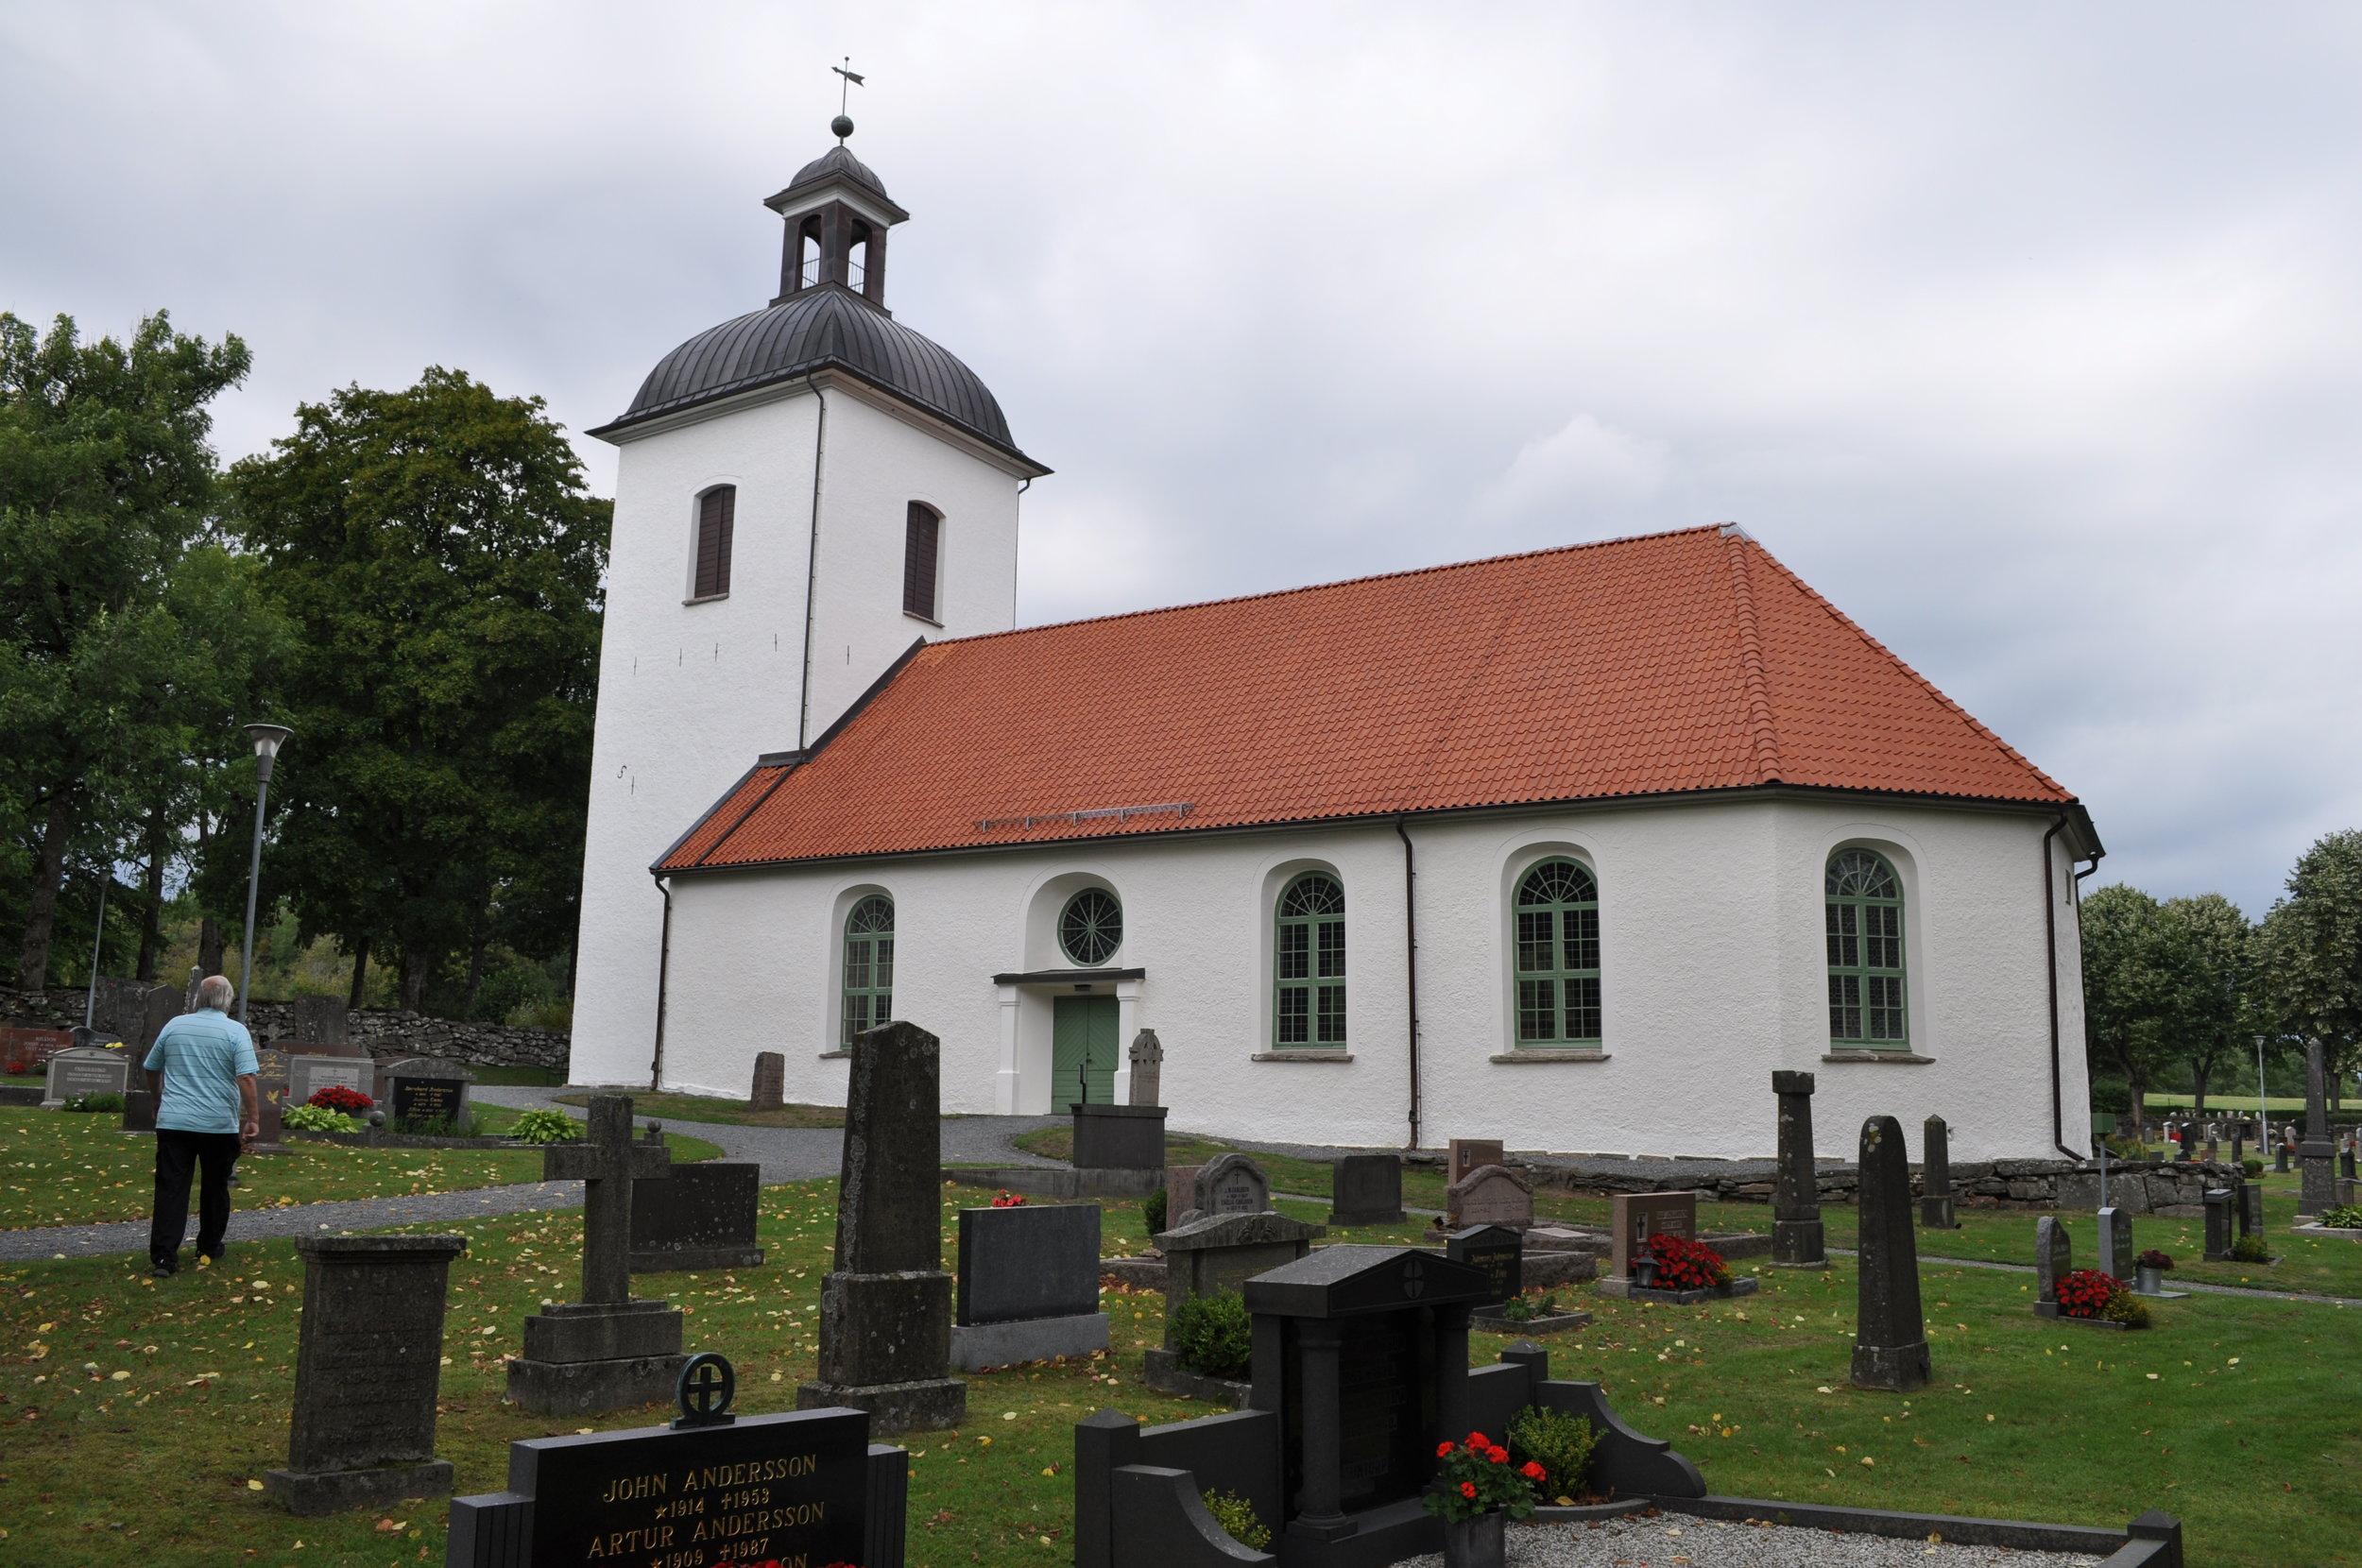 Berghems Church